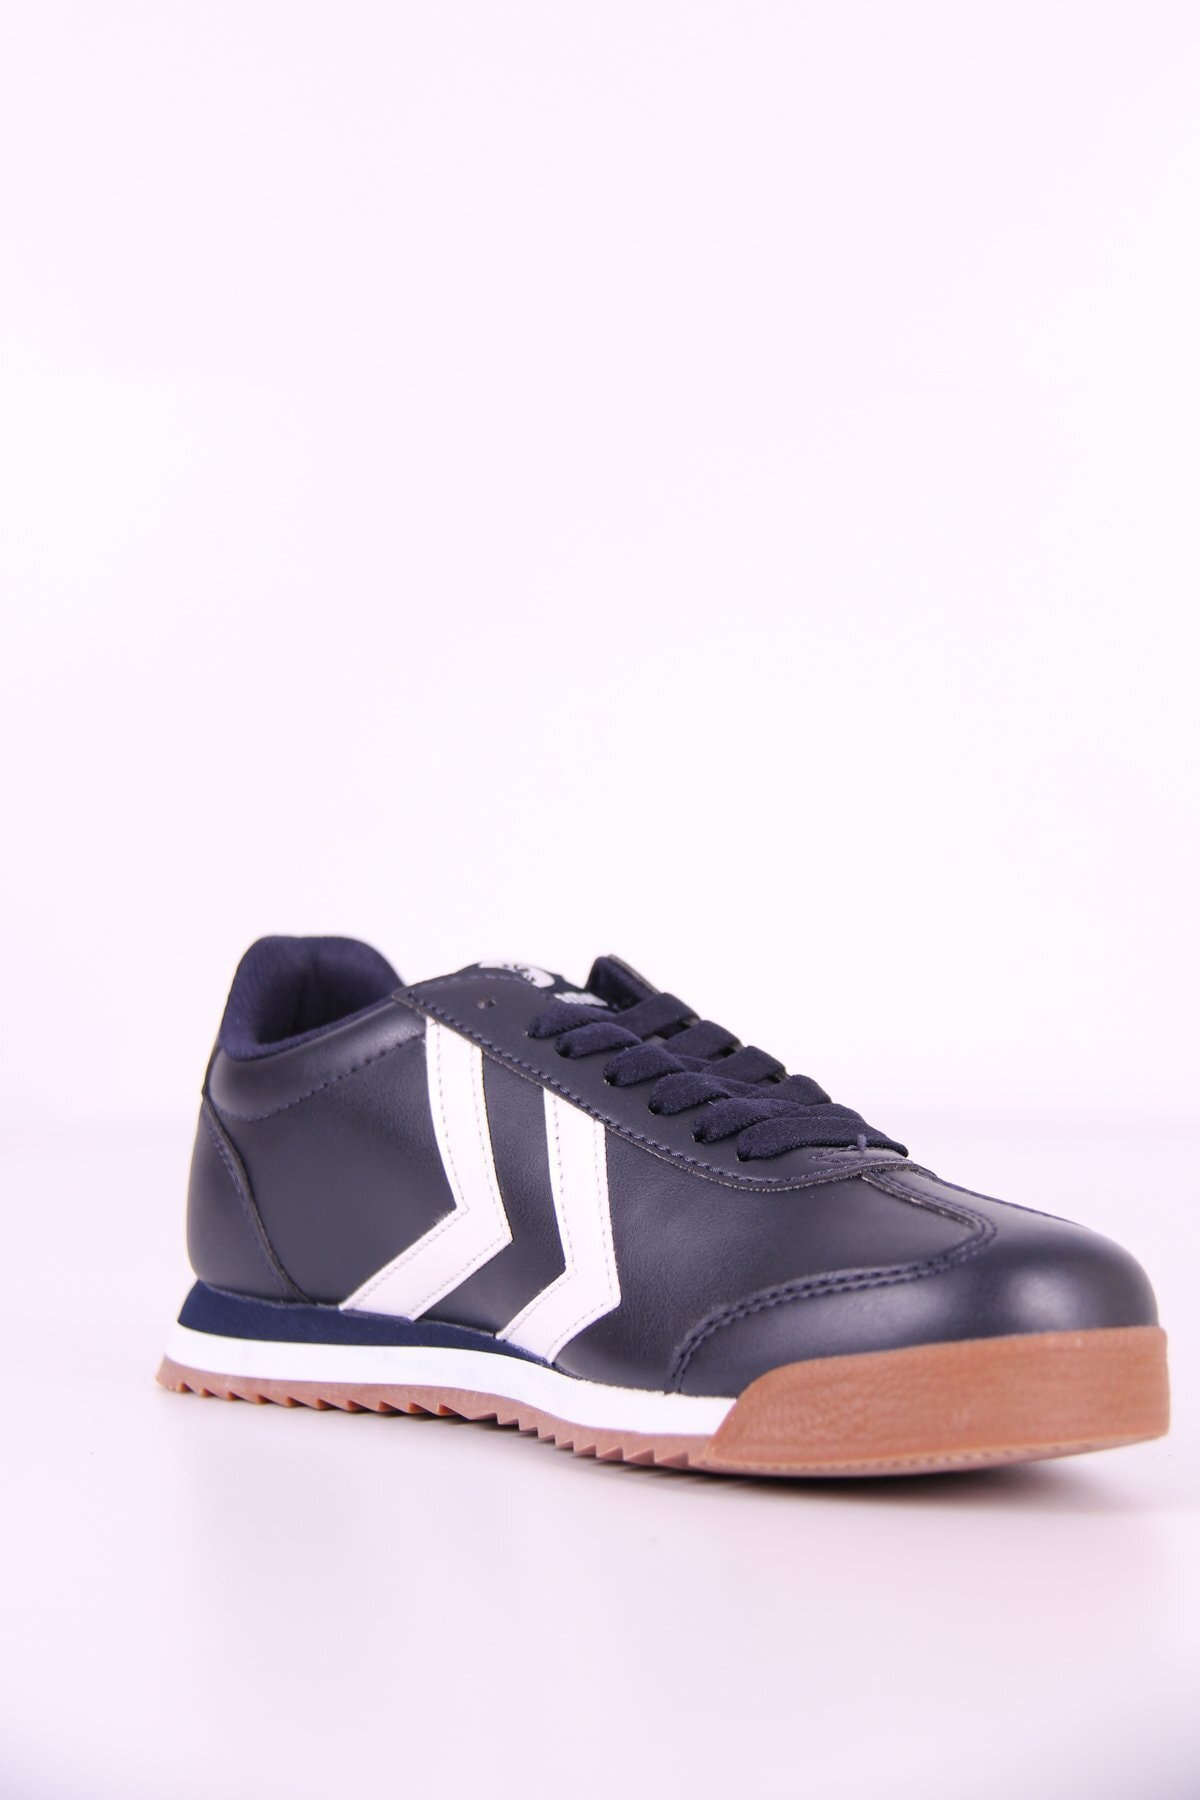 HUMMEL MESSMER 23 Mavi Erkek Sneaker Ayakkabı 100352001 2